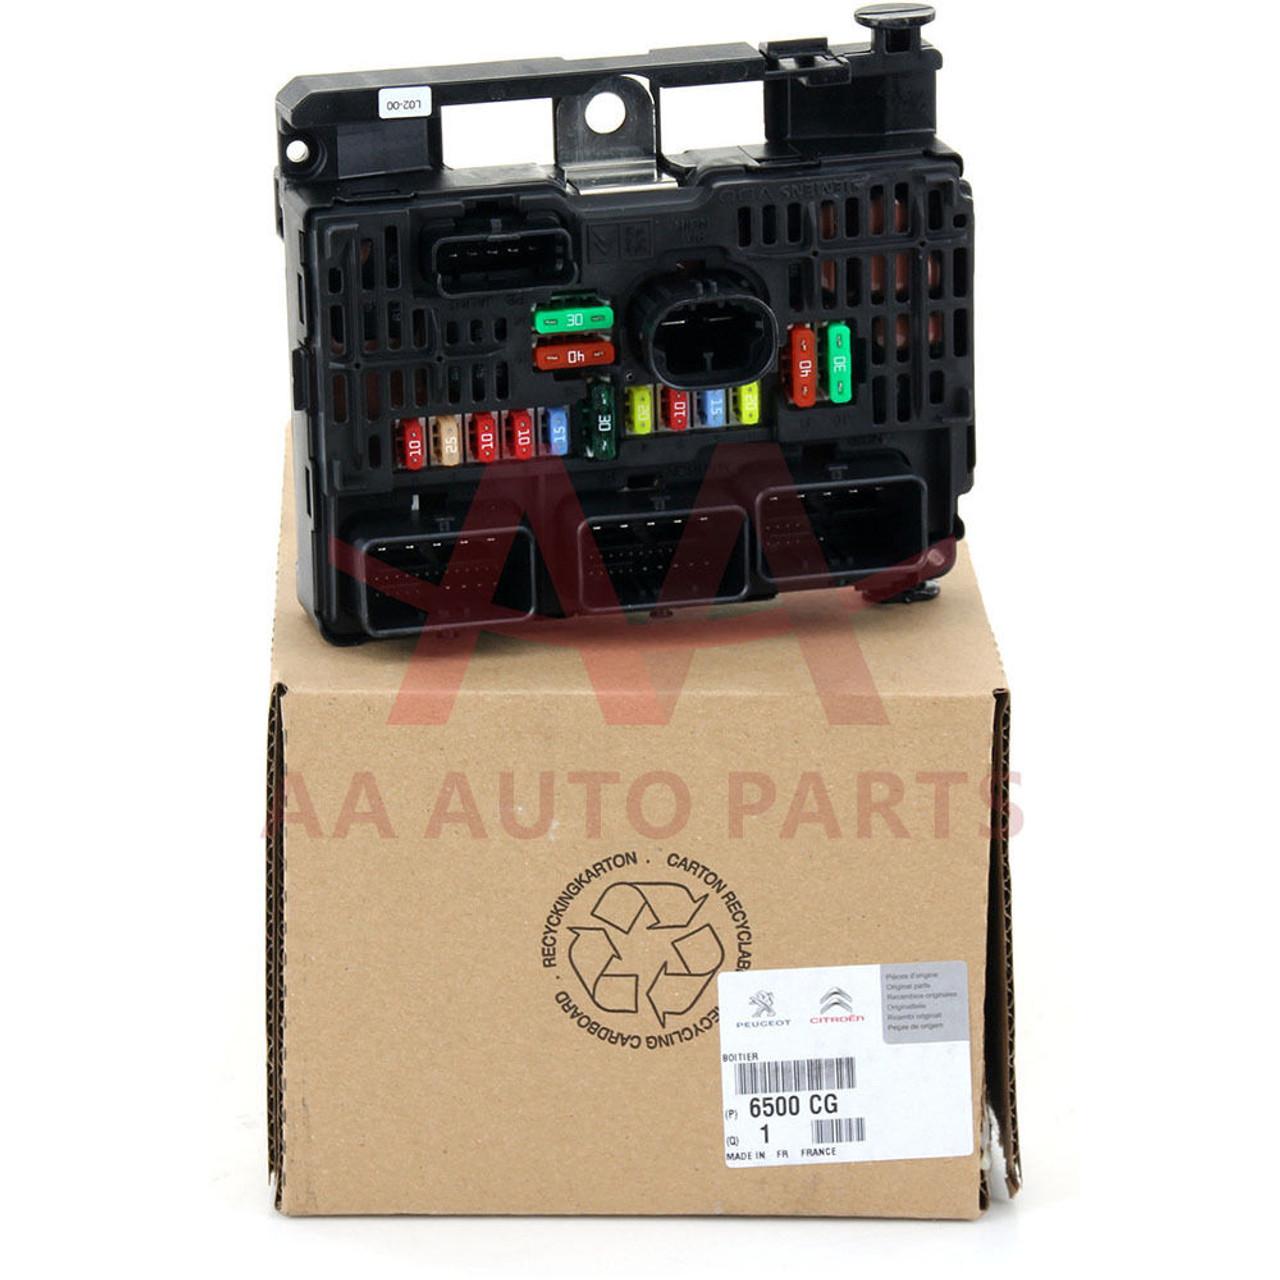 Genuine Peugeot Citroen 30l V6 Engine Fuse Box Part Number 6500cg 407 Location